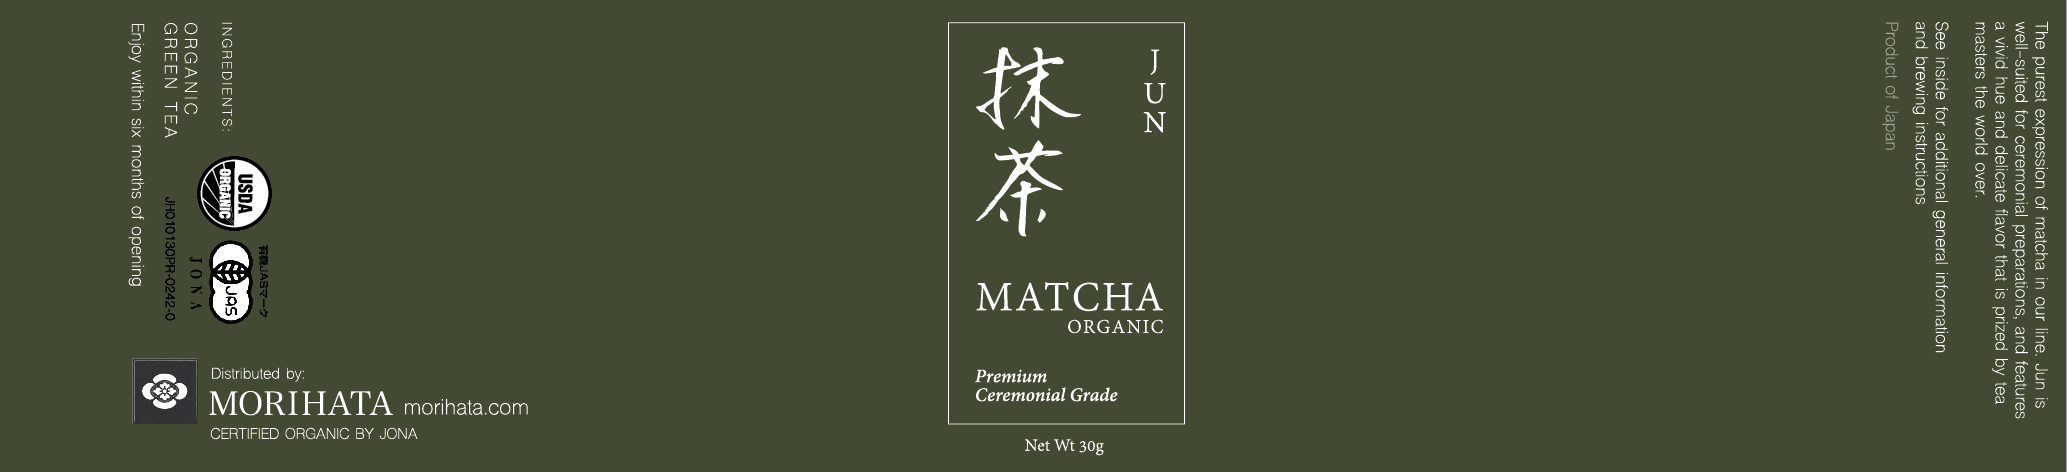 matcha-01.jpg